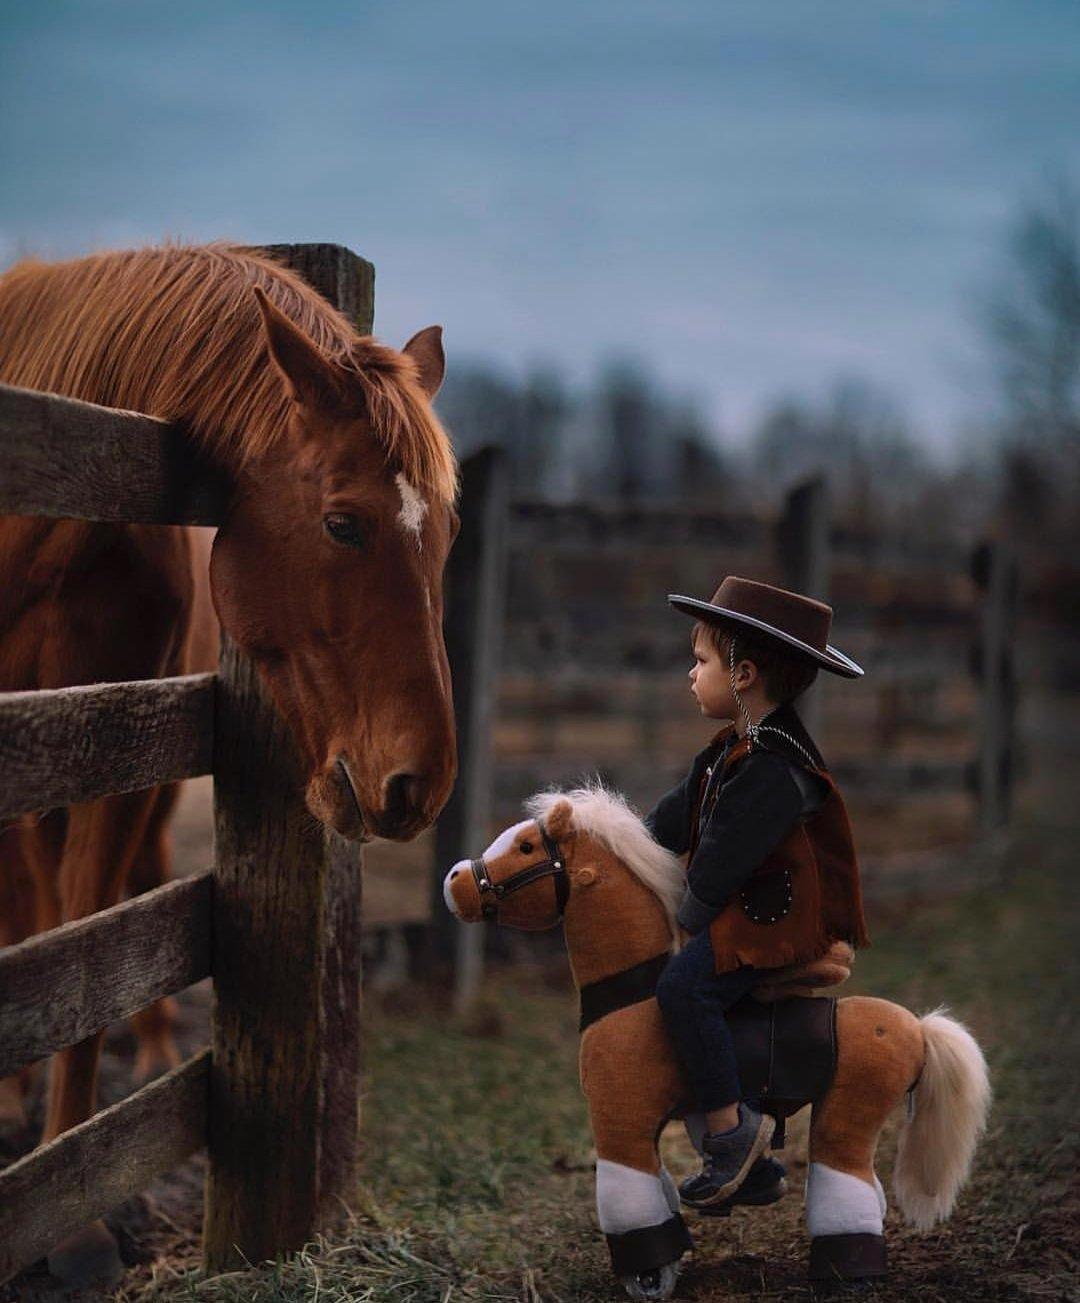 horse_wildlife_photography_27.jpg